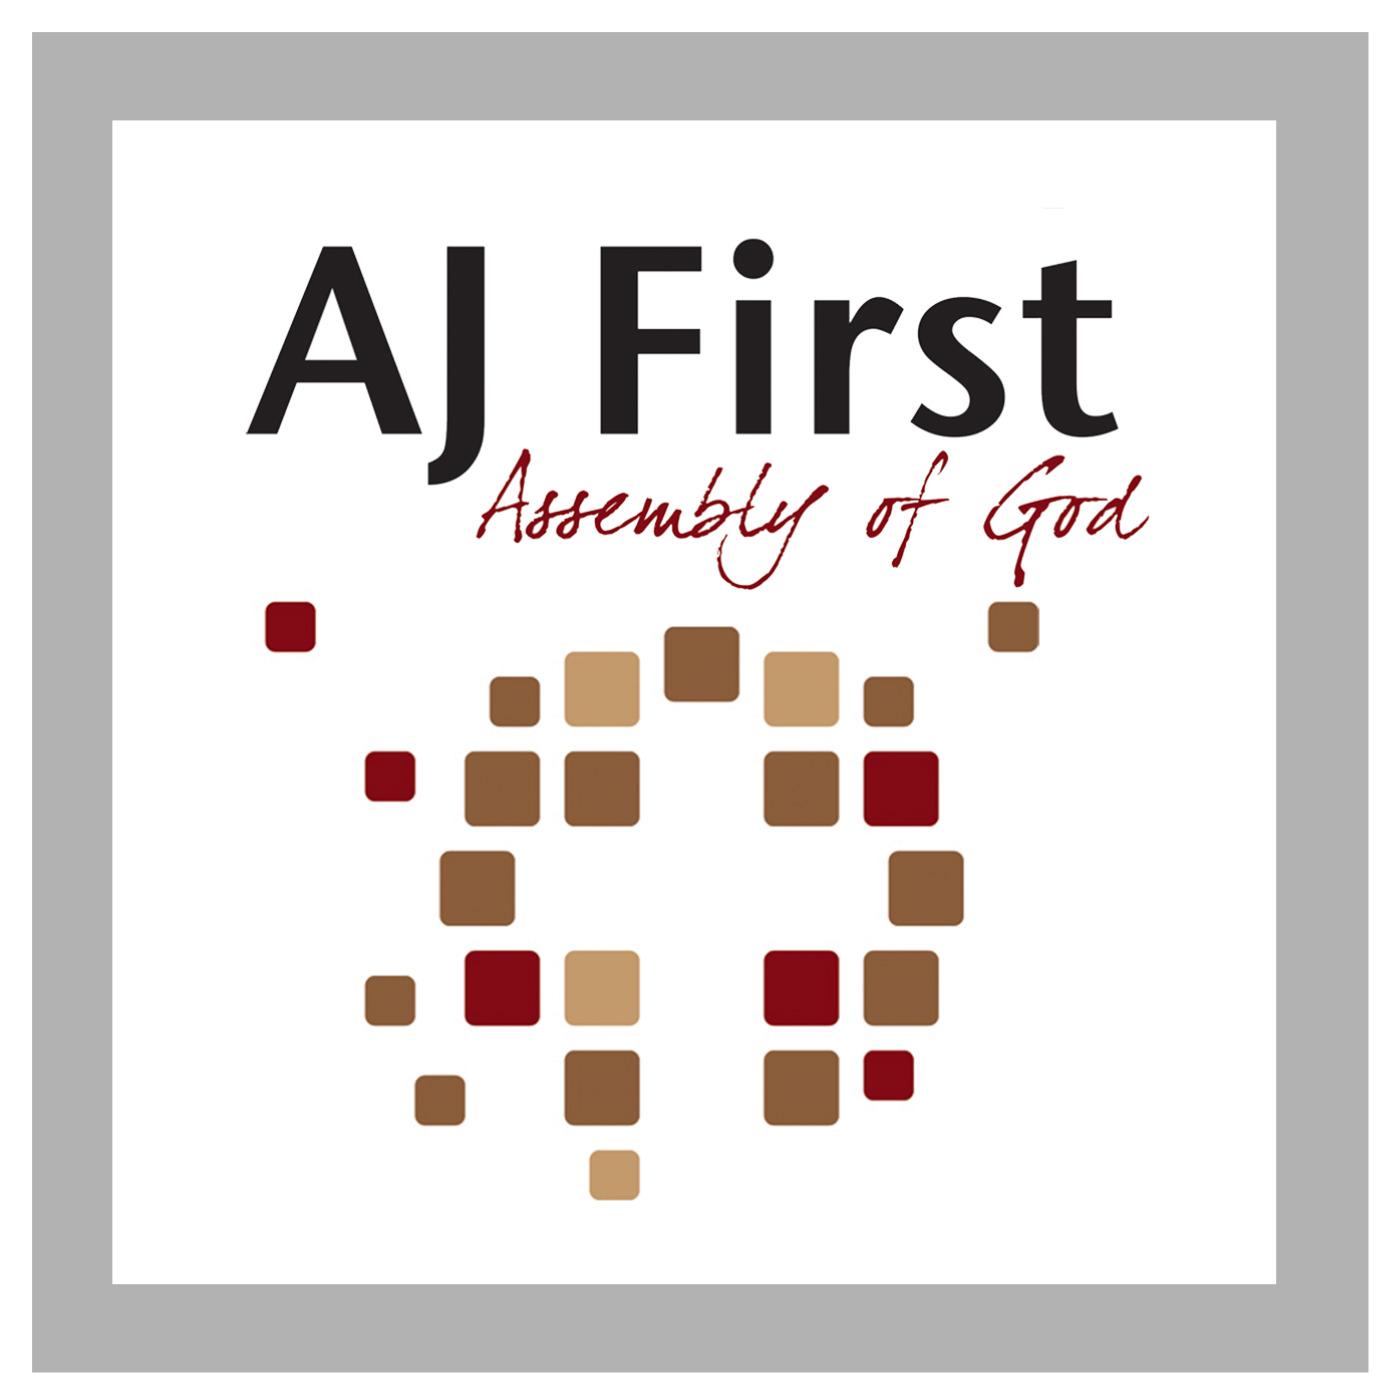 AJ FIrst Media